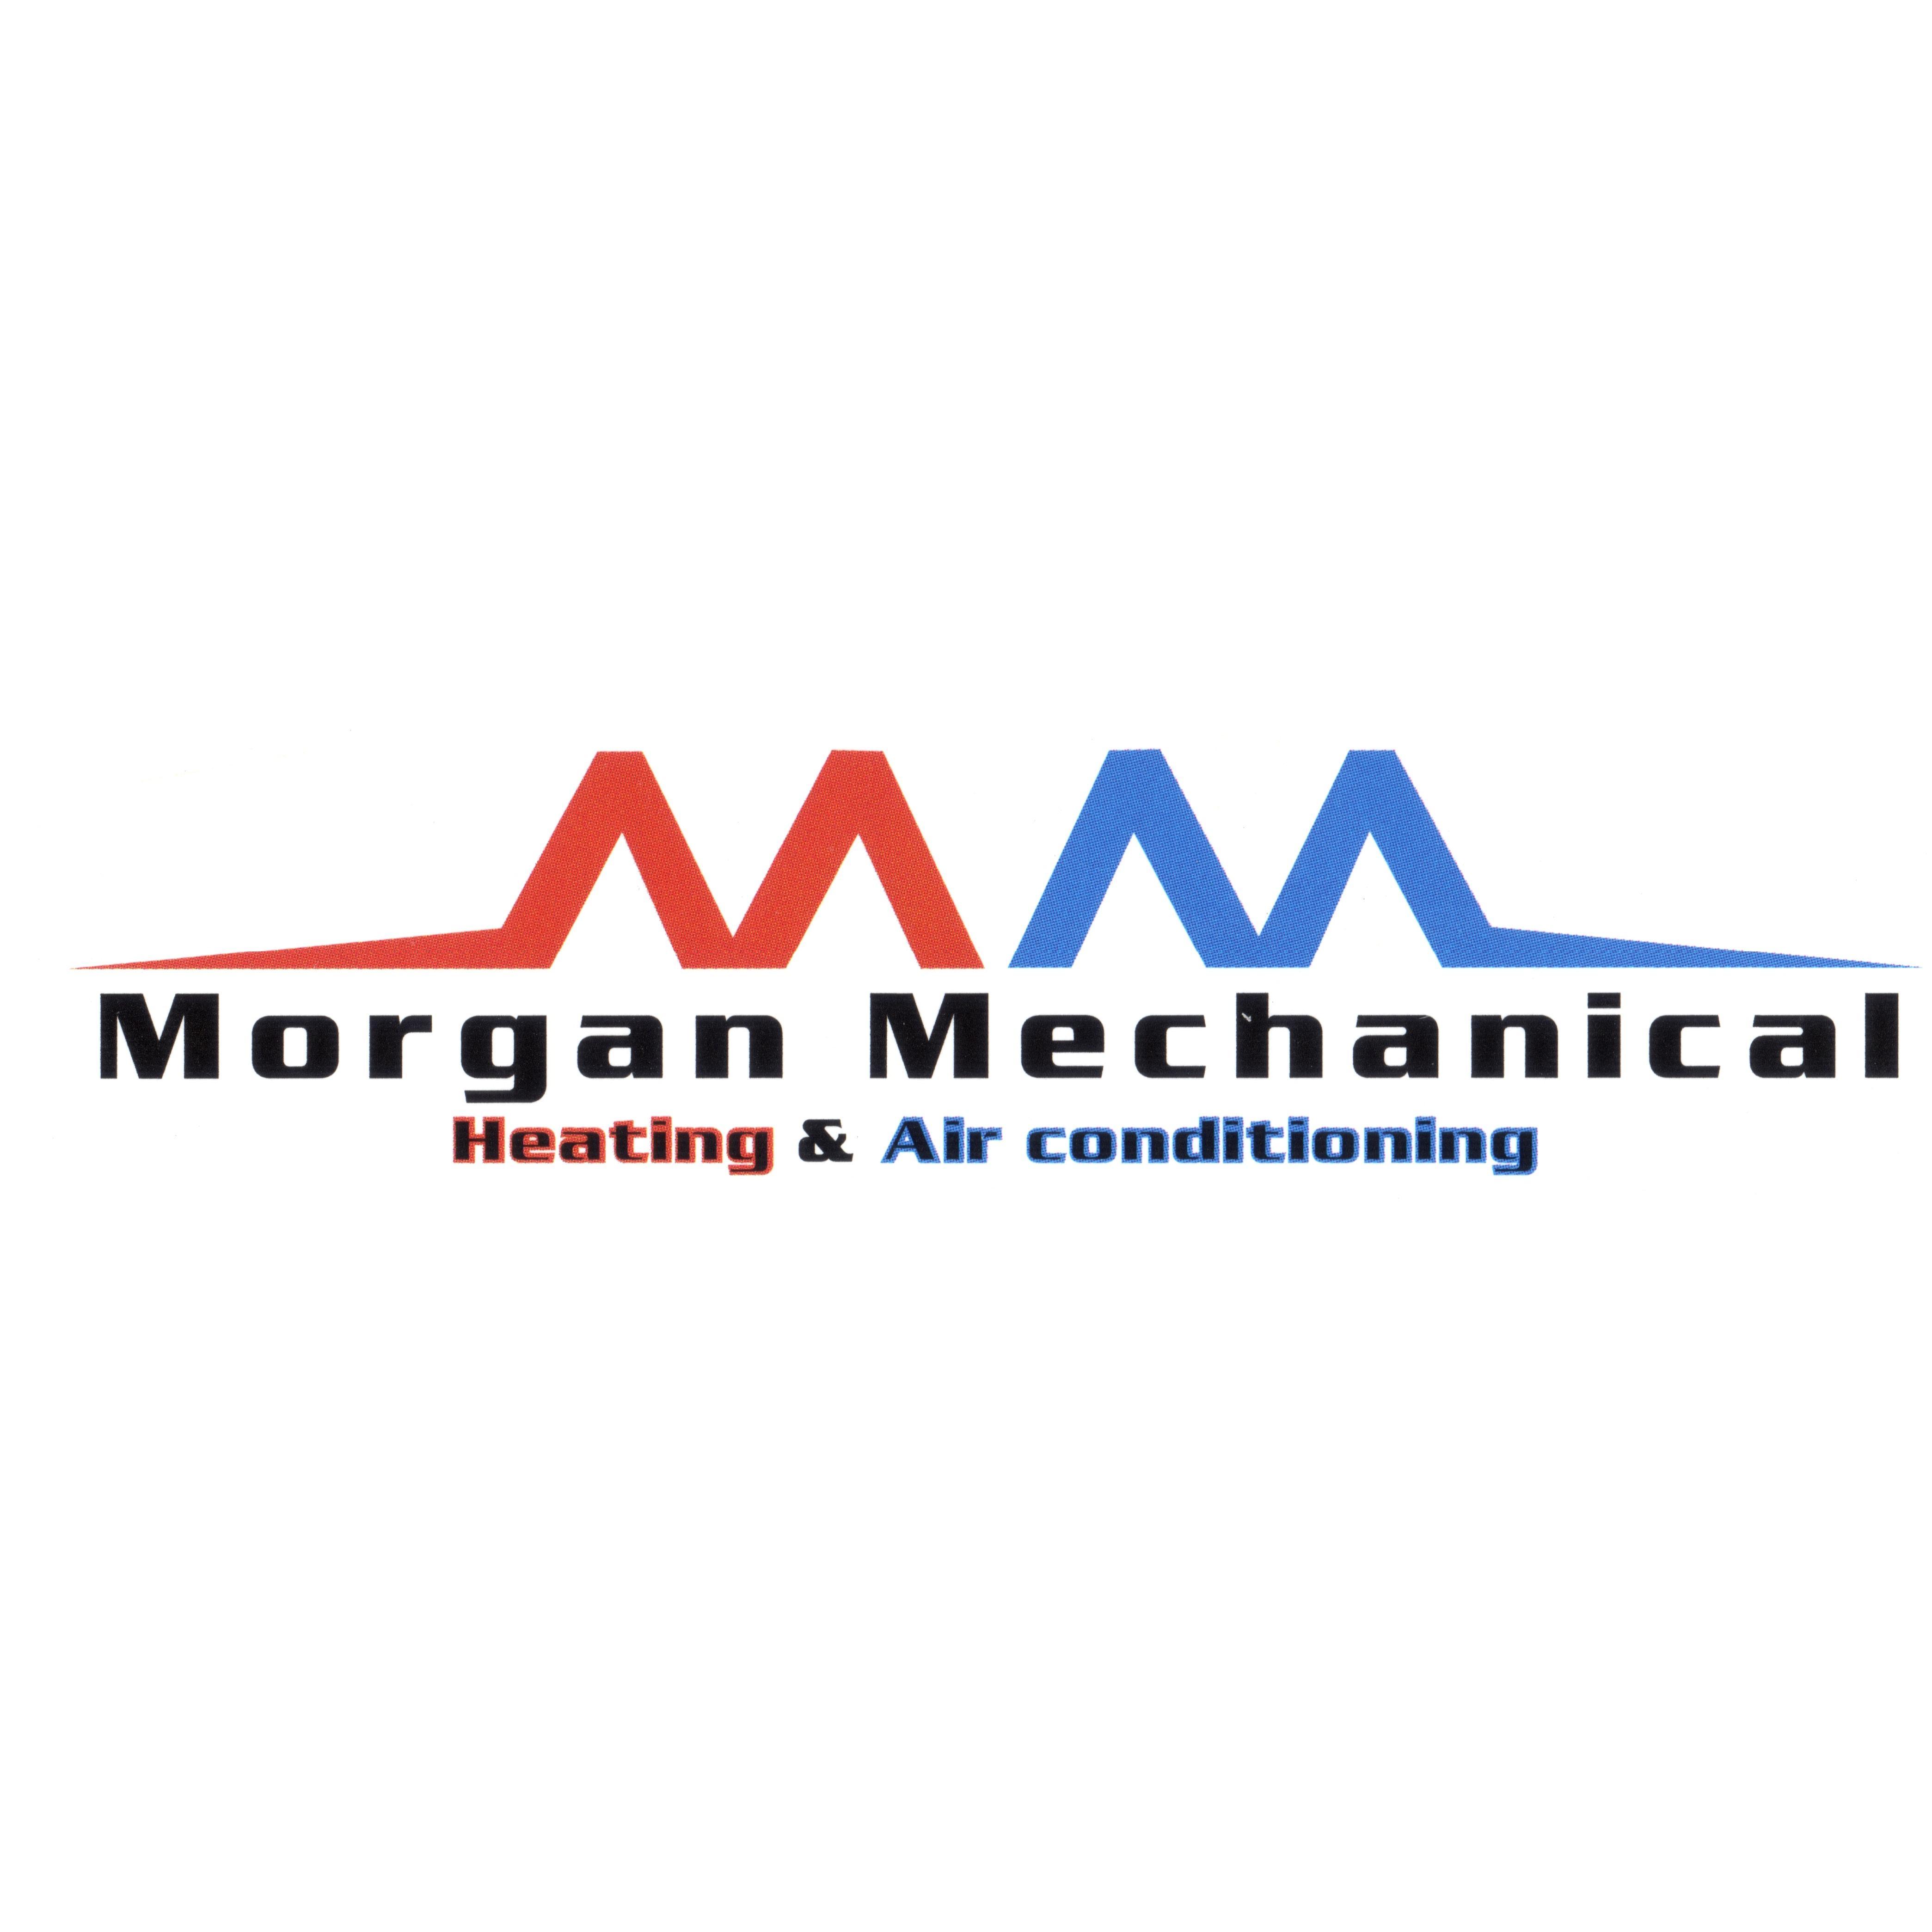 Morgan Mechanical Heating & Air Conditioning